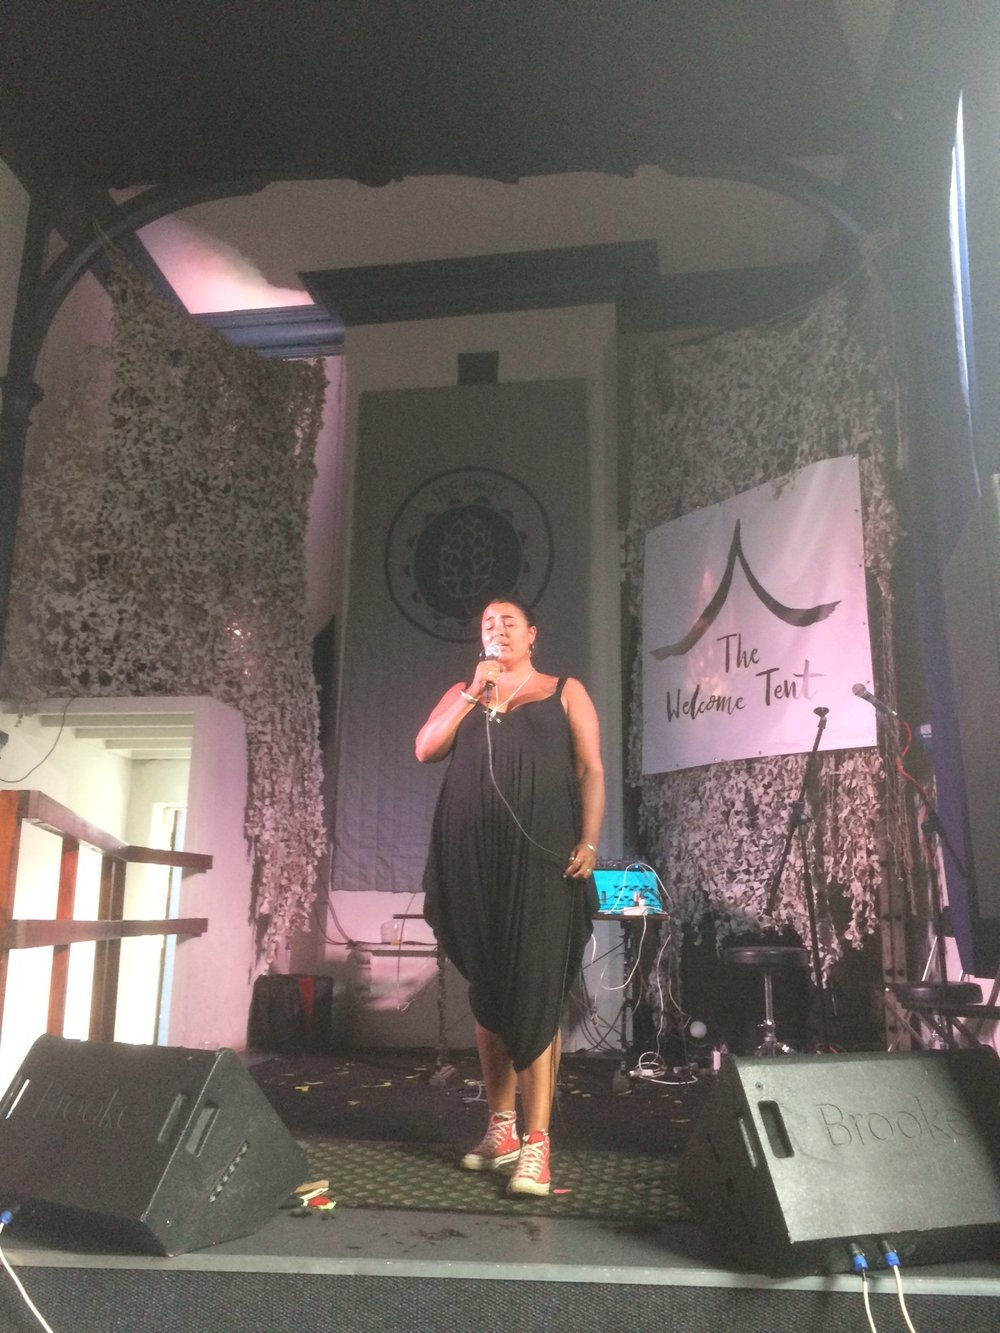 11-2017-august-chailarden-thewelcometent-nottingham-angel-humanKINDER.JPG